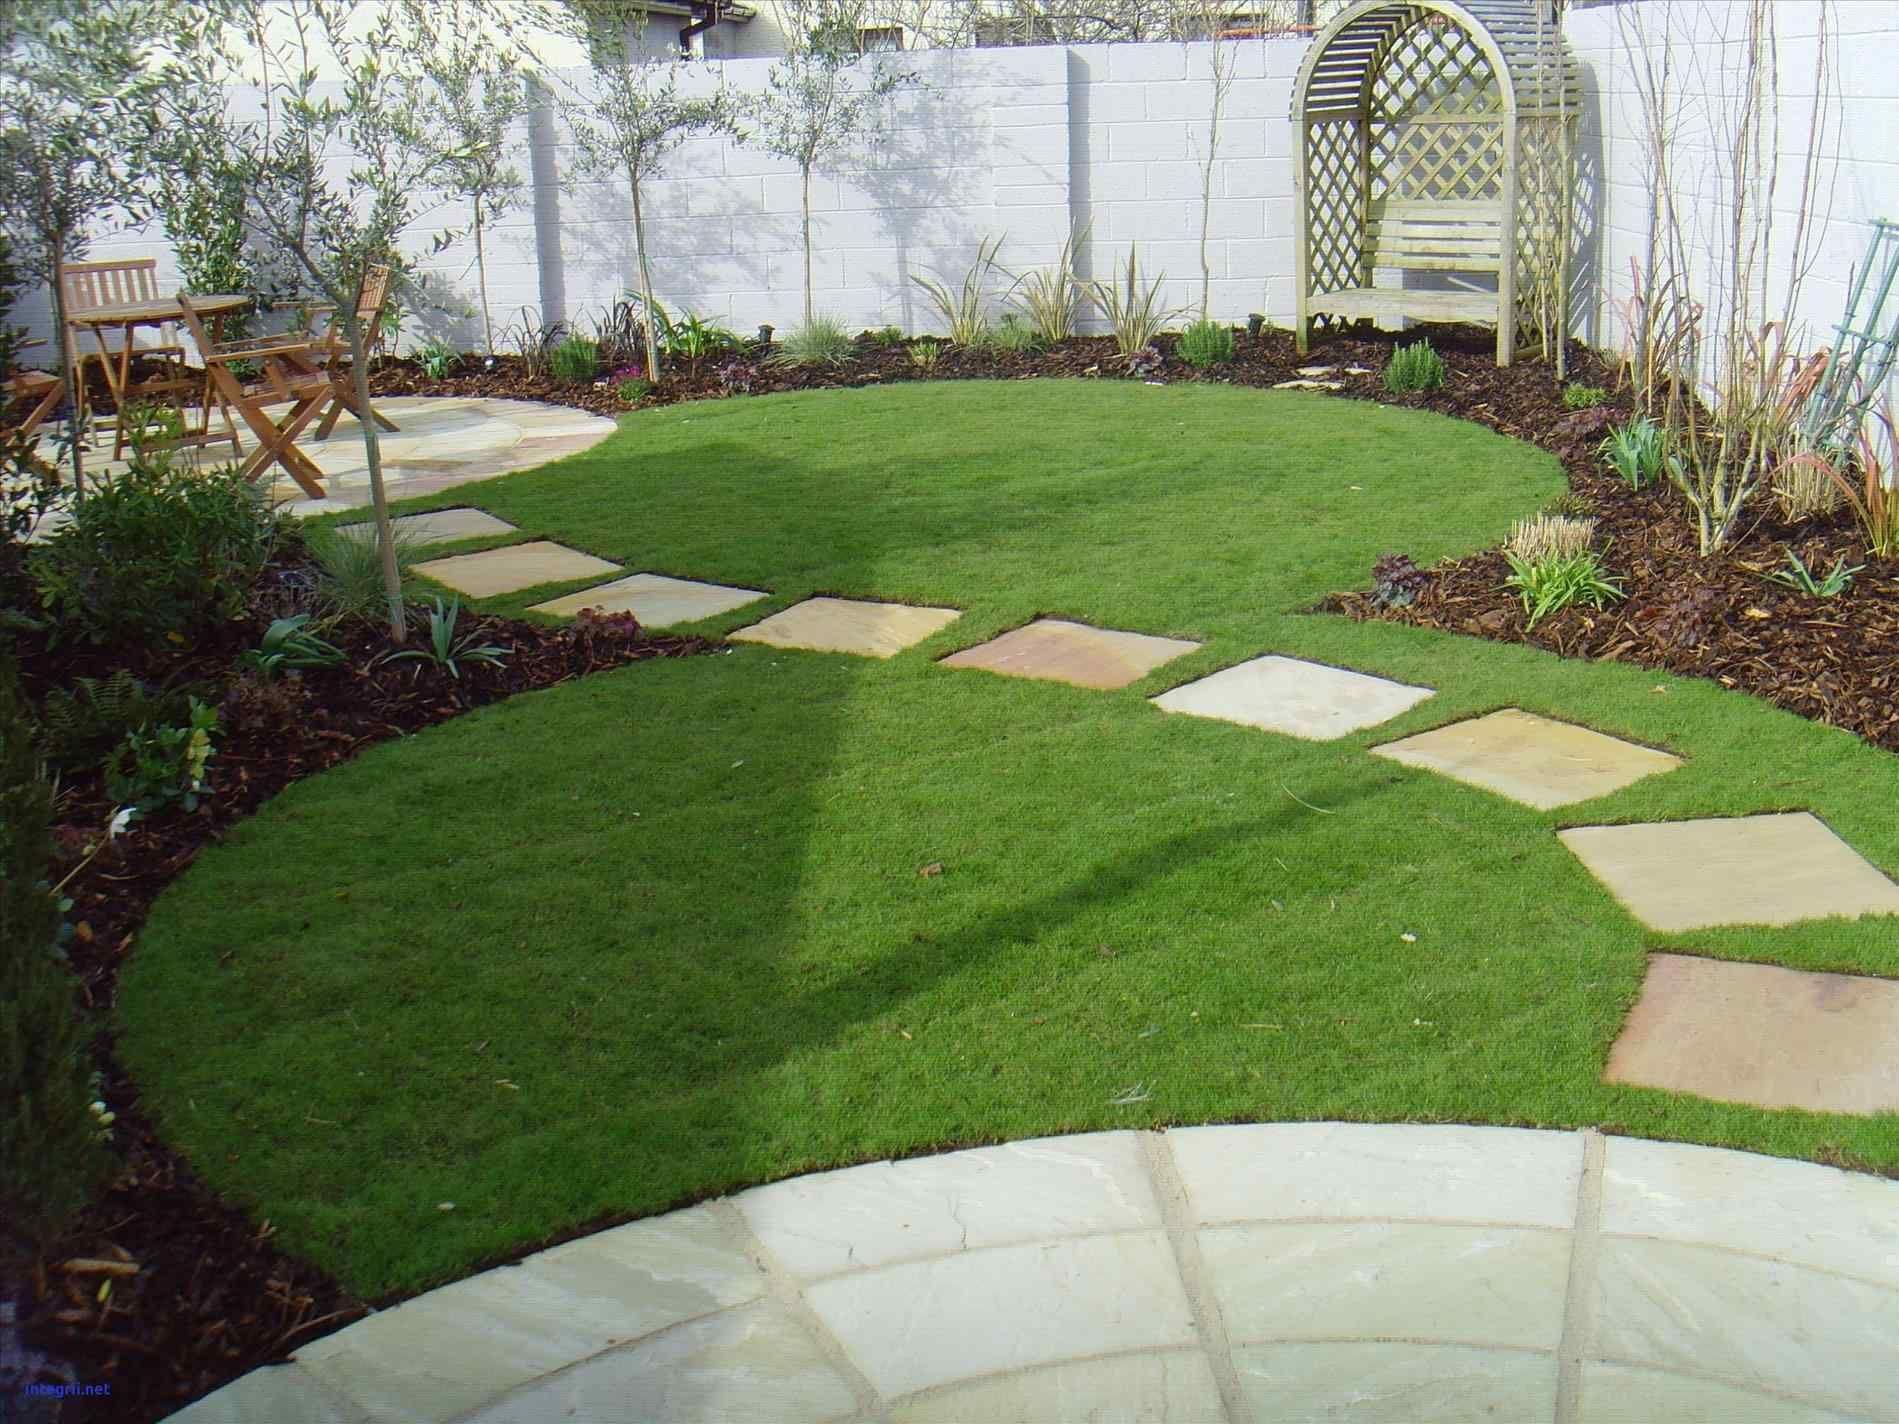 20 Gorgeous Stone Stepping Stones Ideas For Garden Paths Breakpr Circular Garden Design Lawn Design Small Garden Landscape